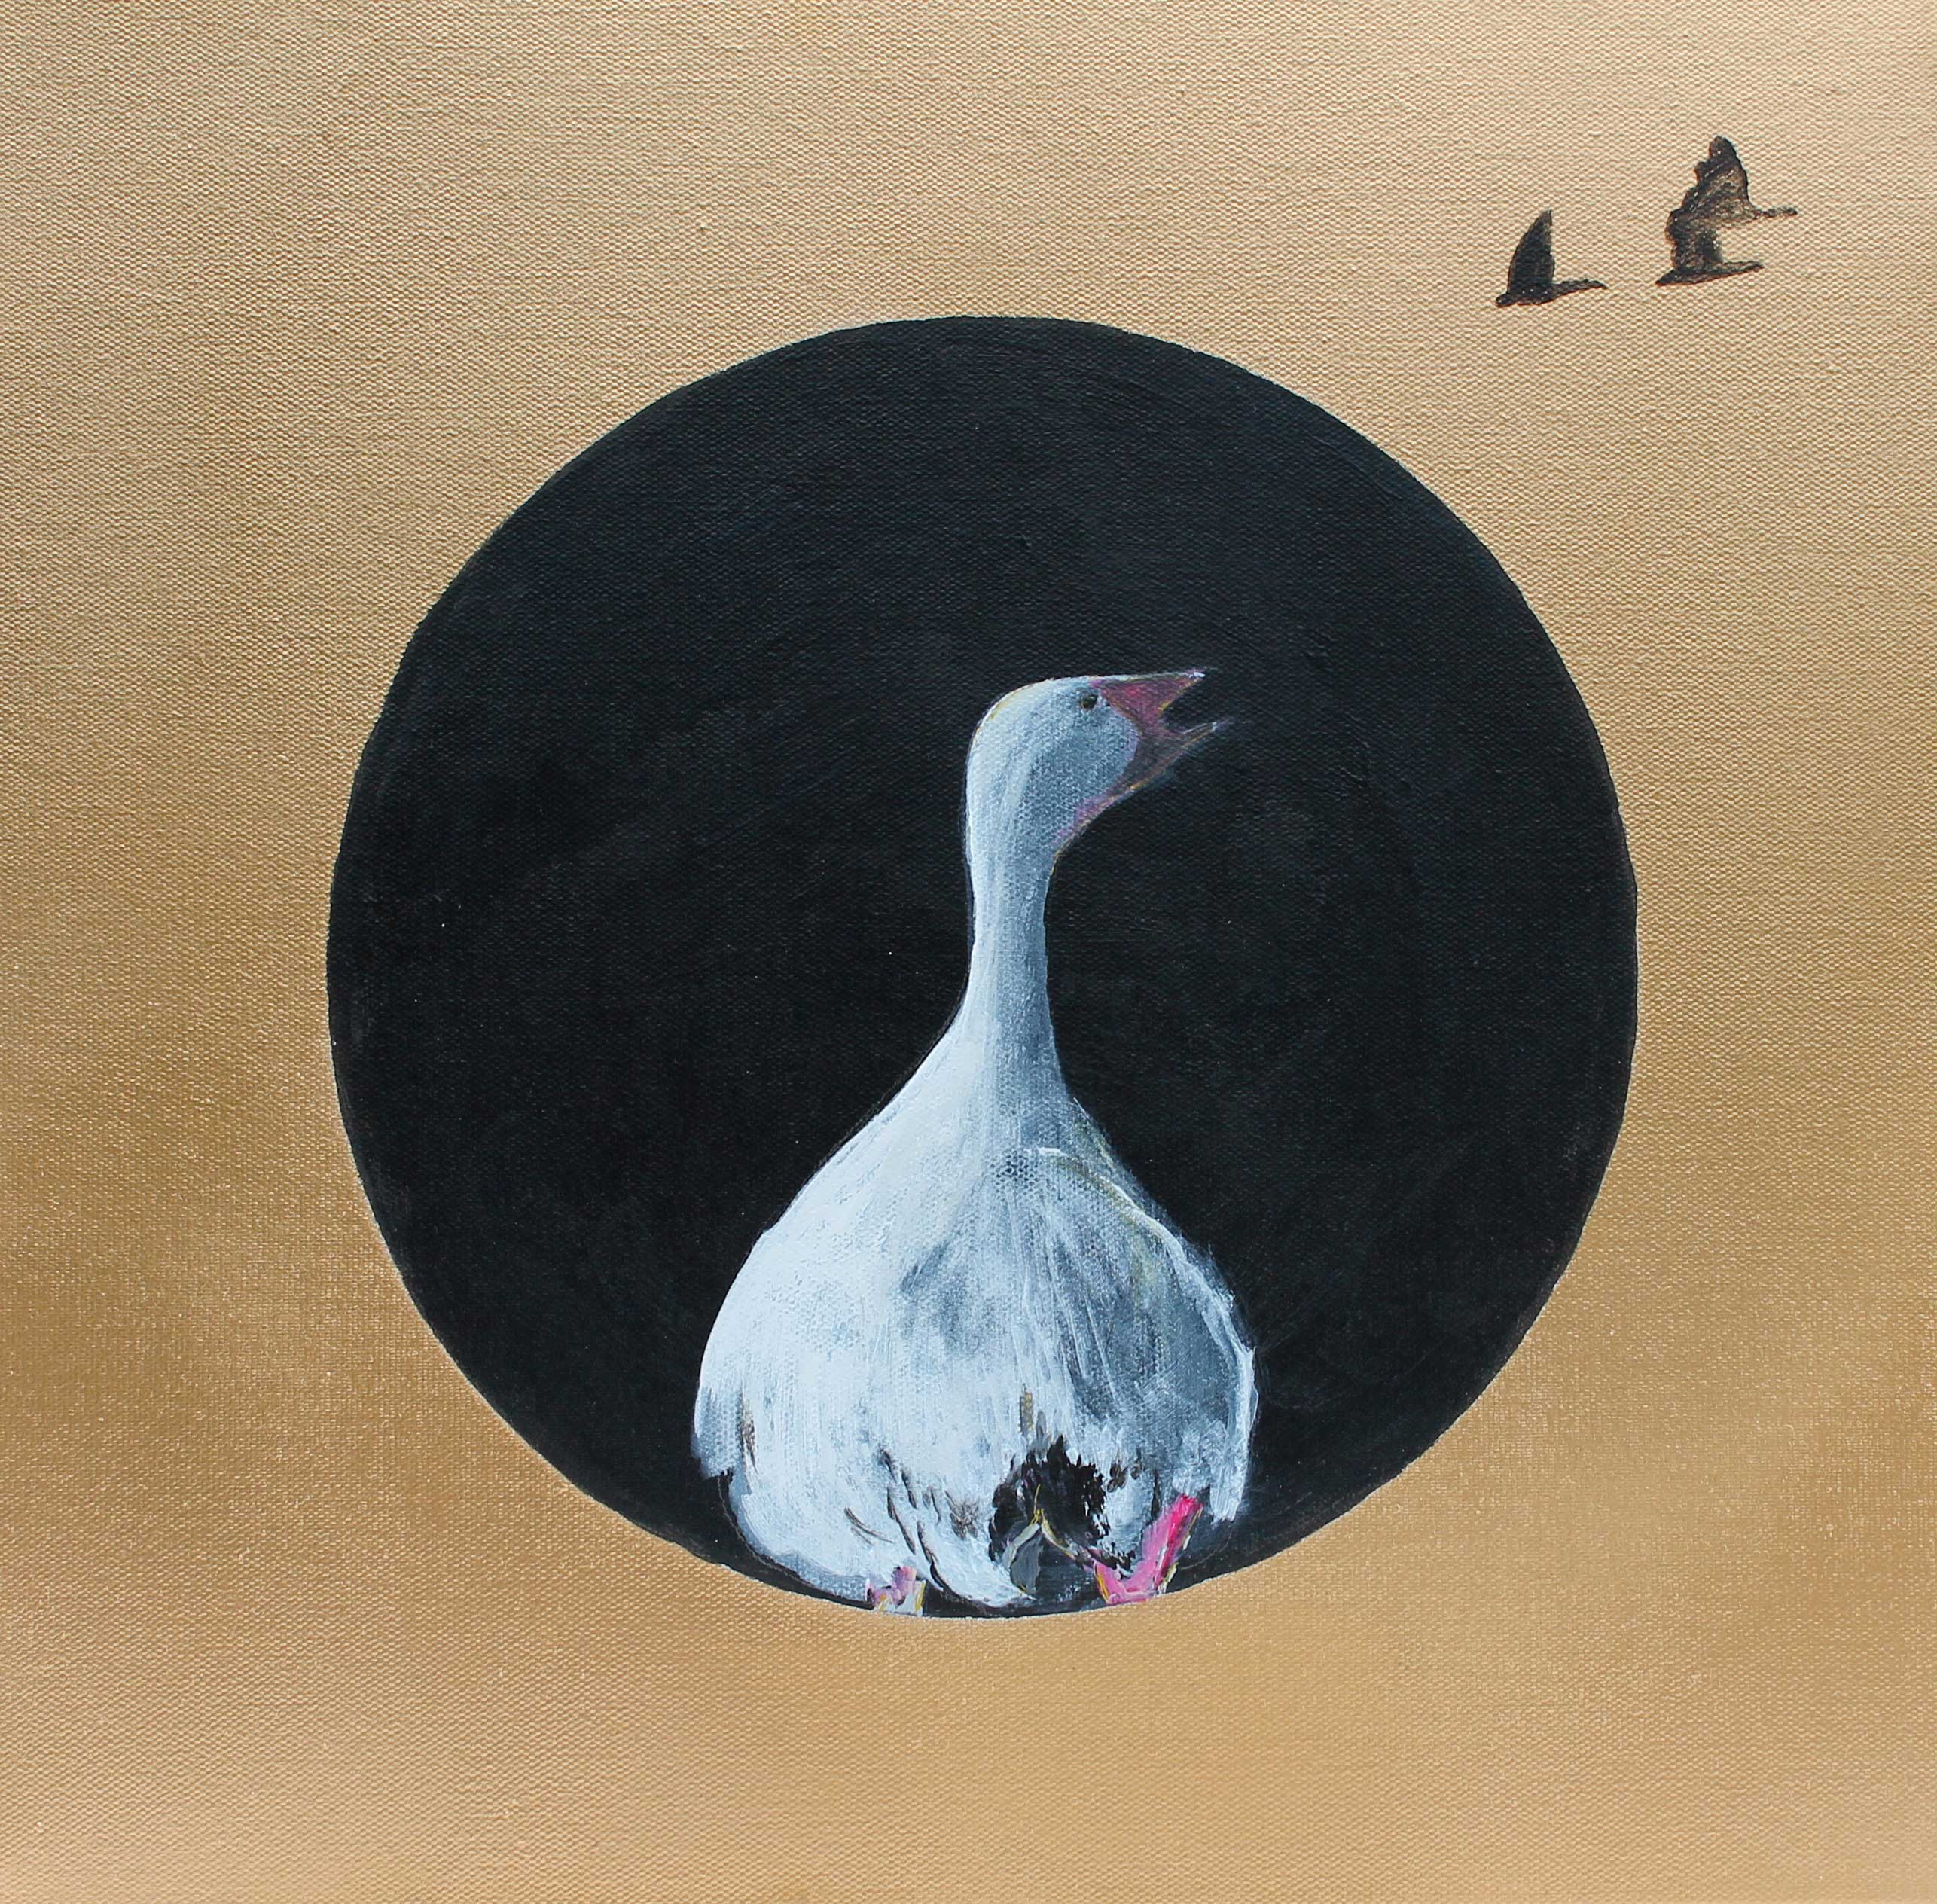 Oeuvre de Marie-Andrée La Salle